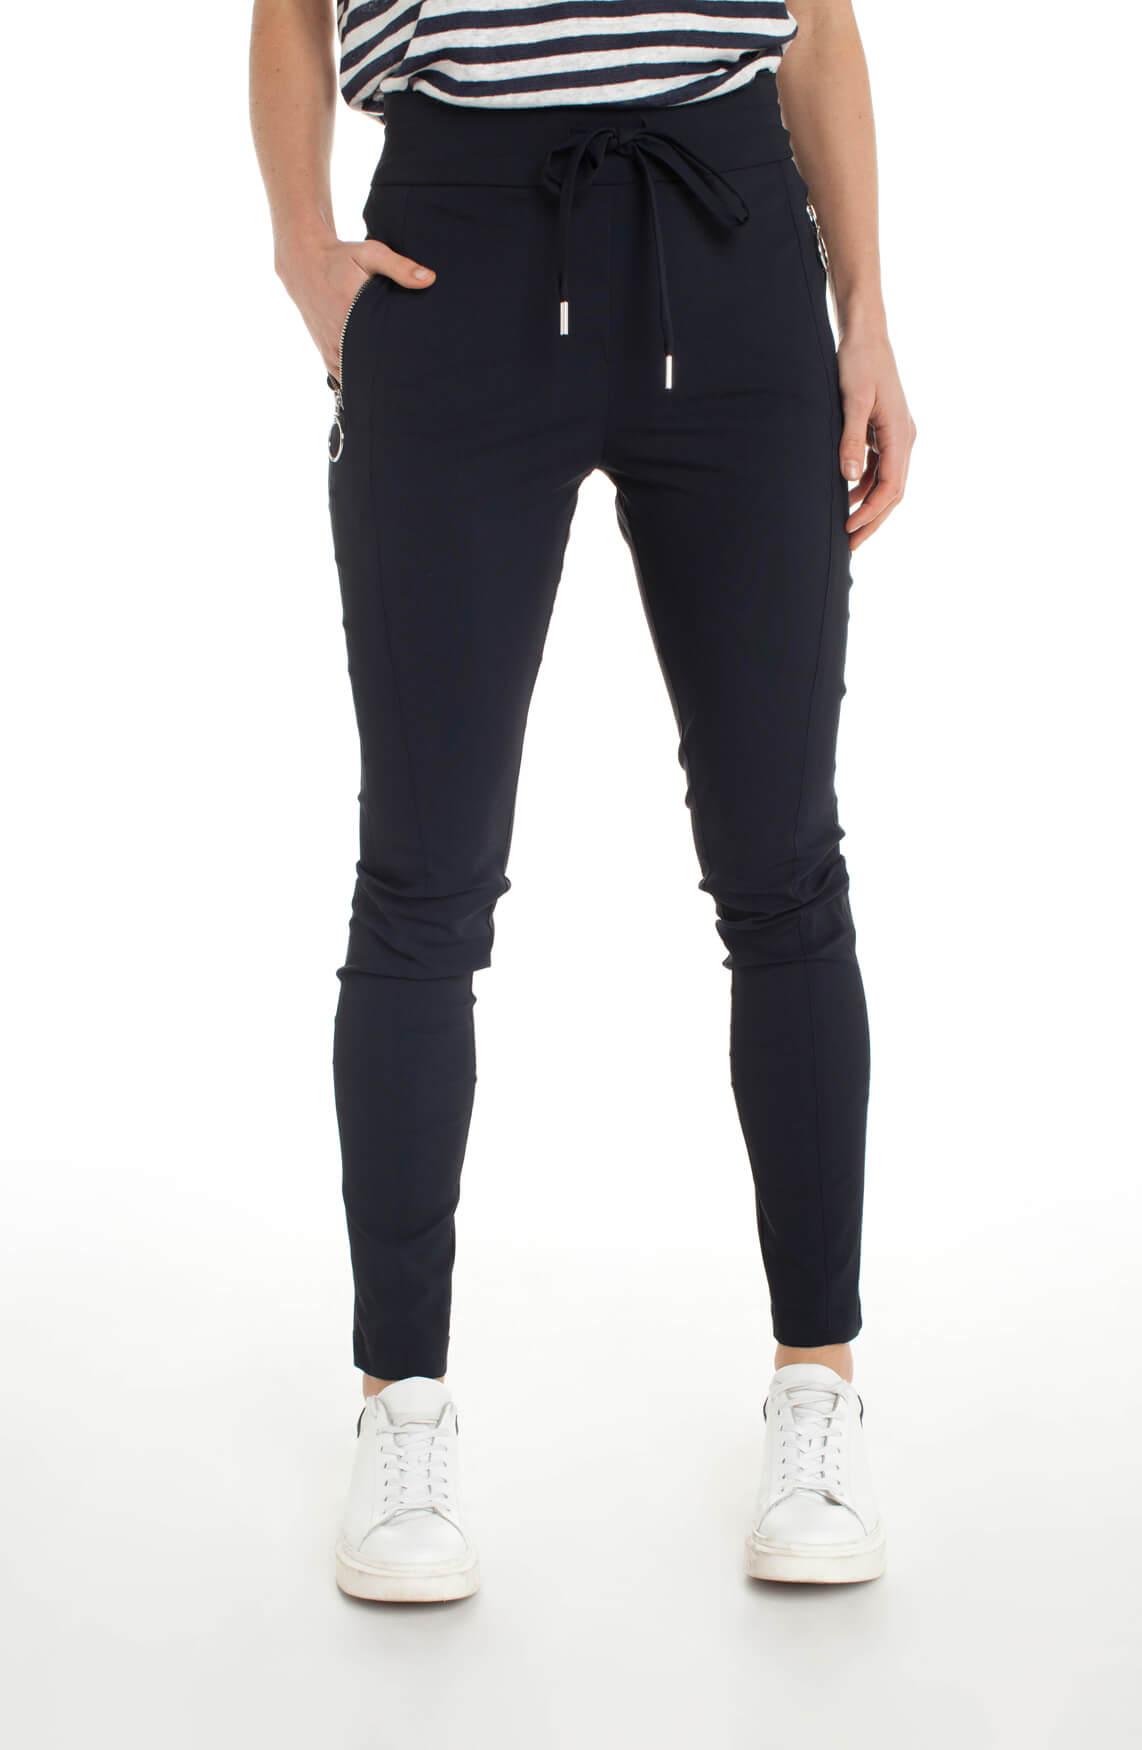 Jane Lushka Dames Jersey jogpantalon Blauw